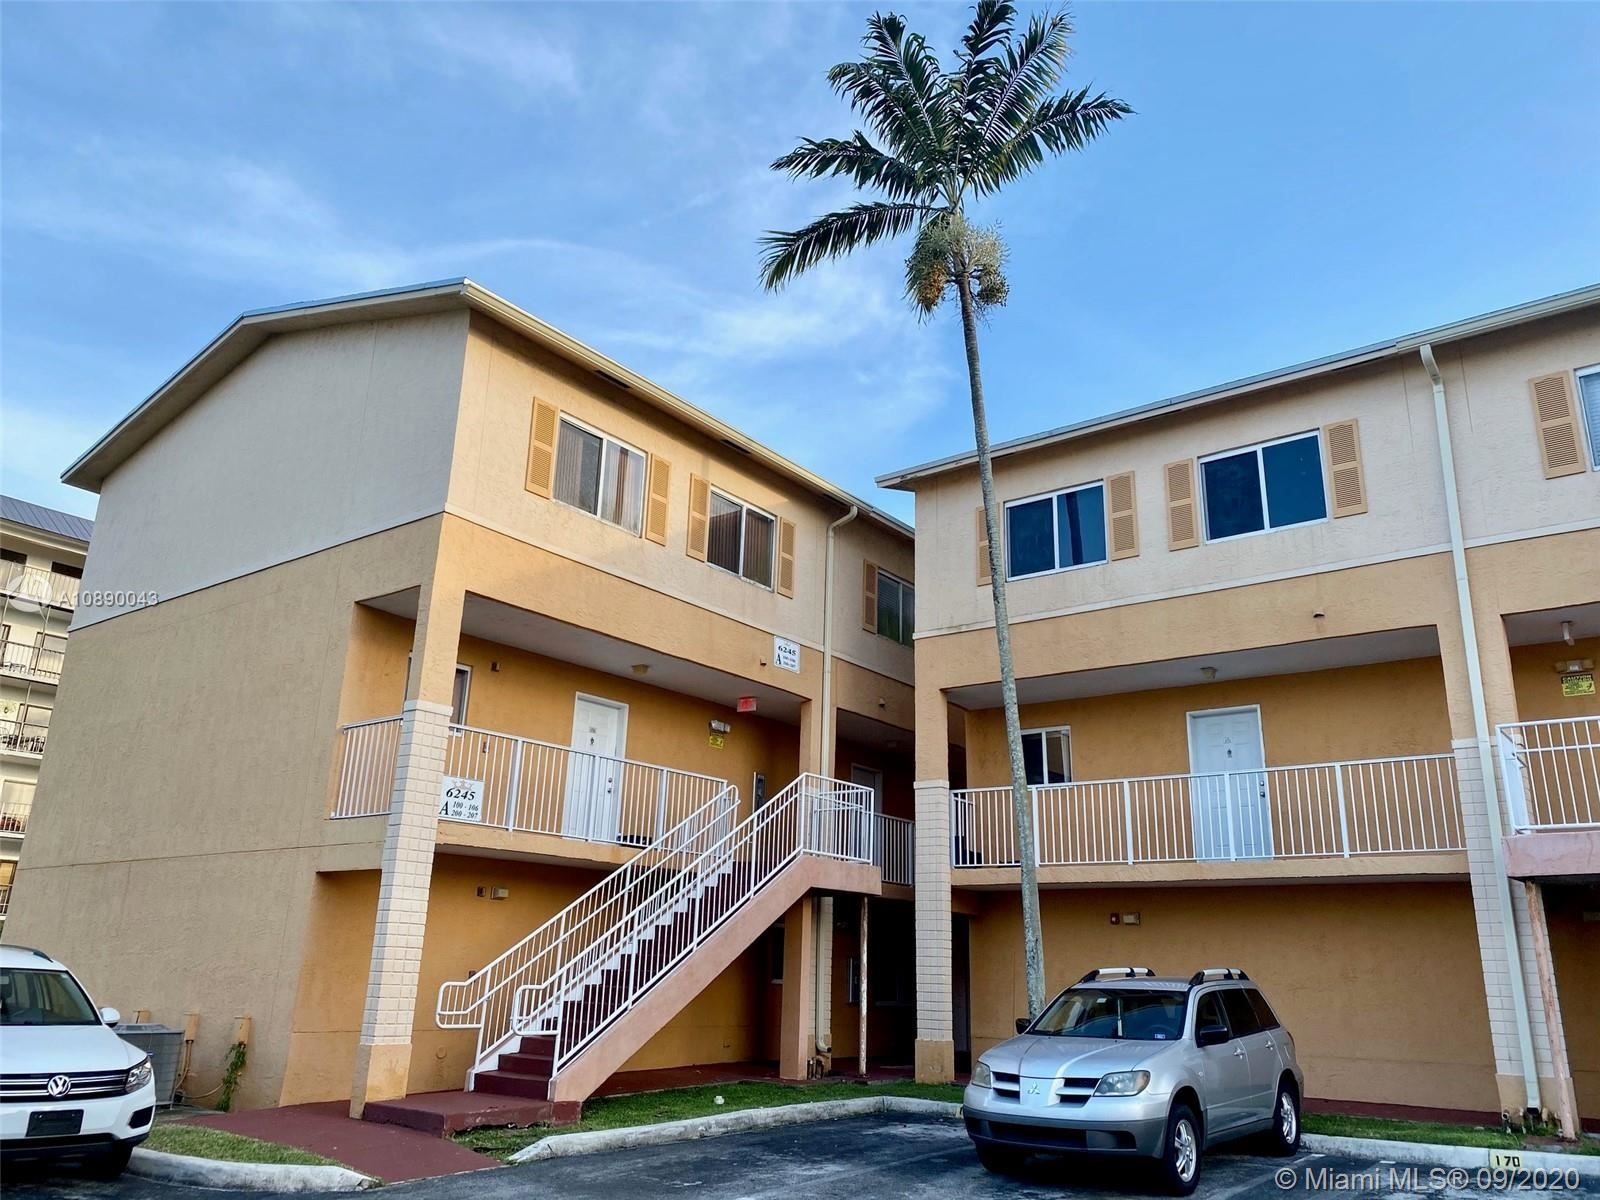 6245 Kendale Lakes Cir #100, Miami, FL 33183 - #: A10890043